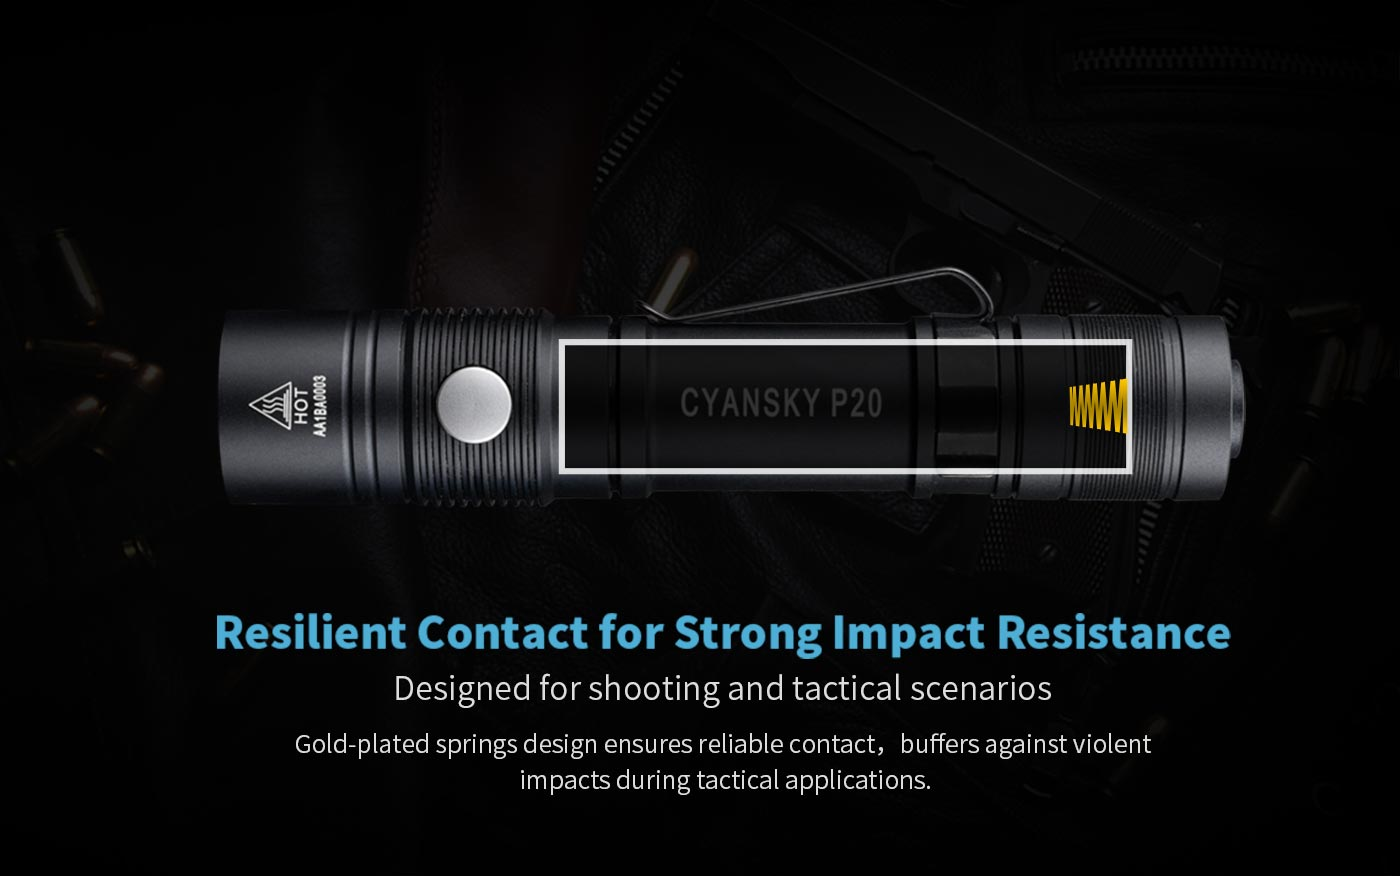 impact resistant led flashlight, led flashlight torch, led outdoor torch